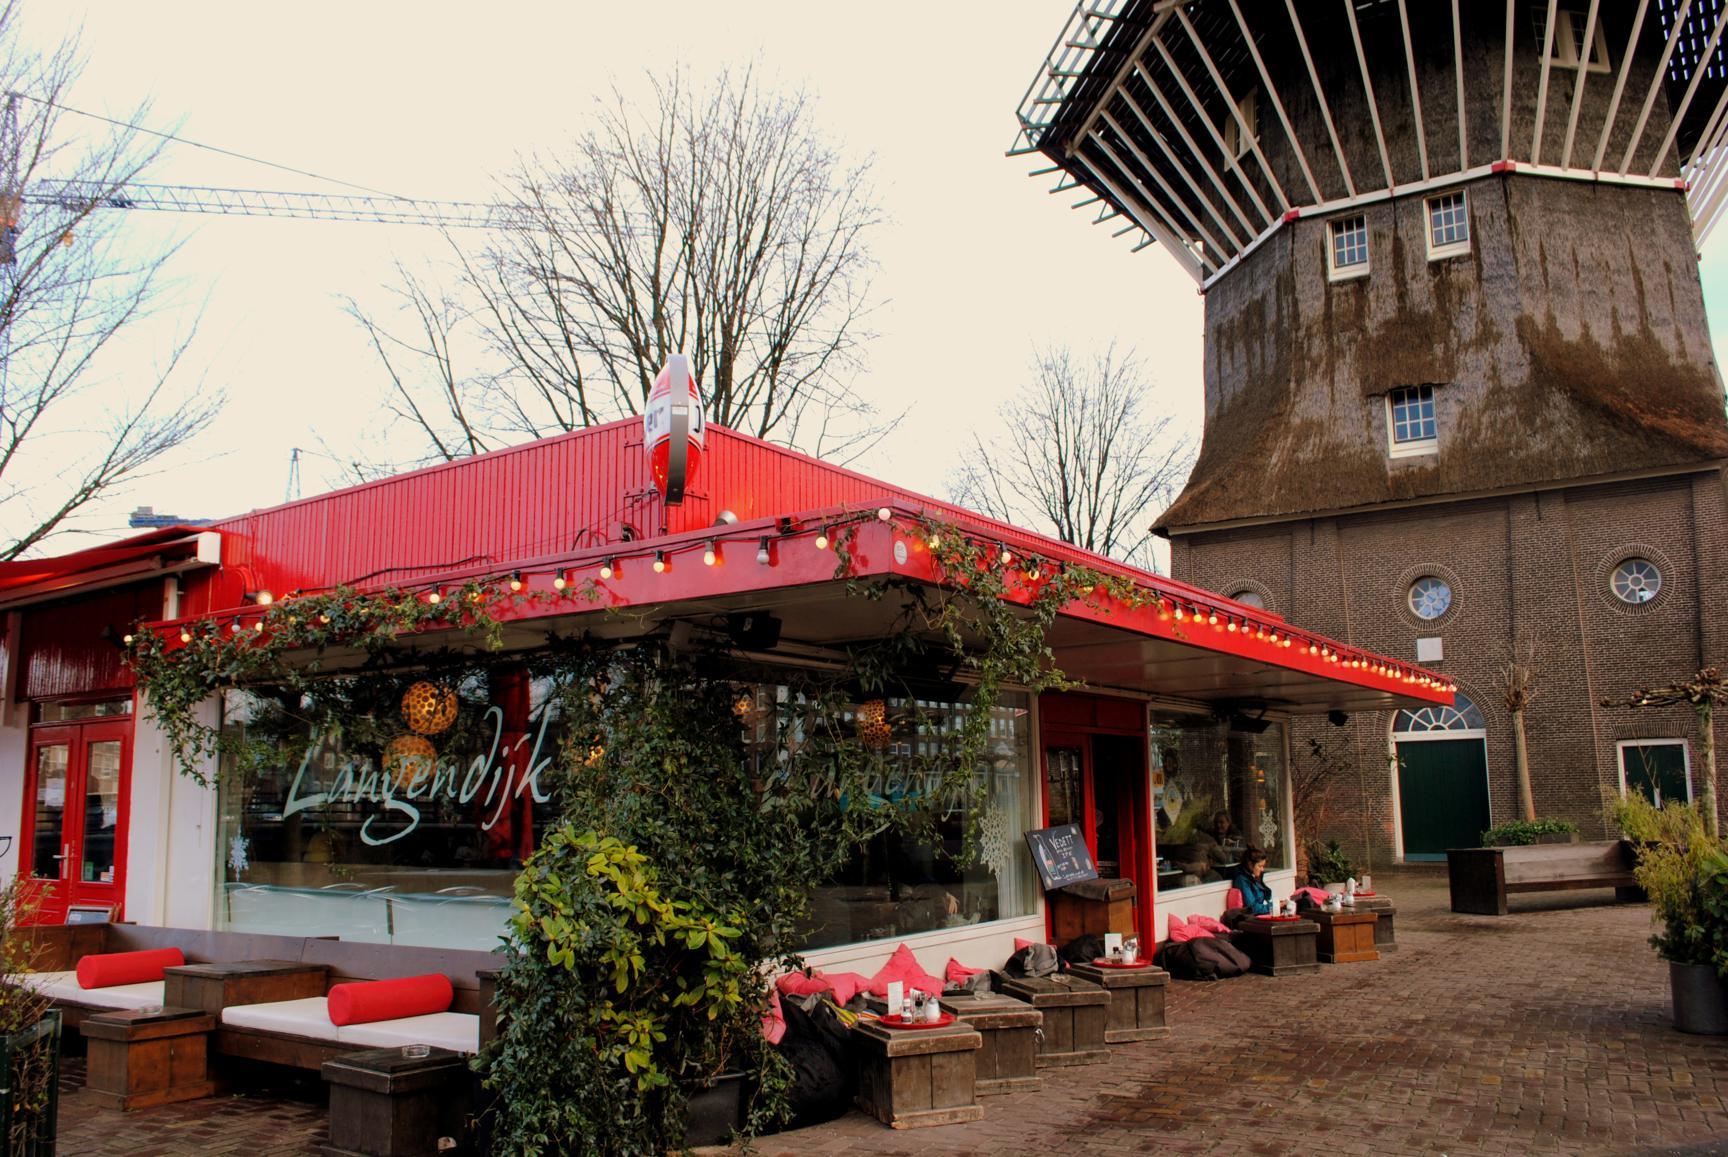 donde-comer-amsterdam-Langendijk